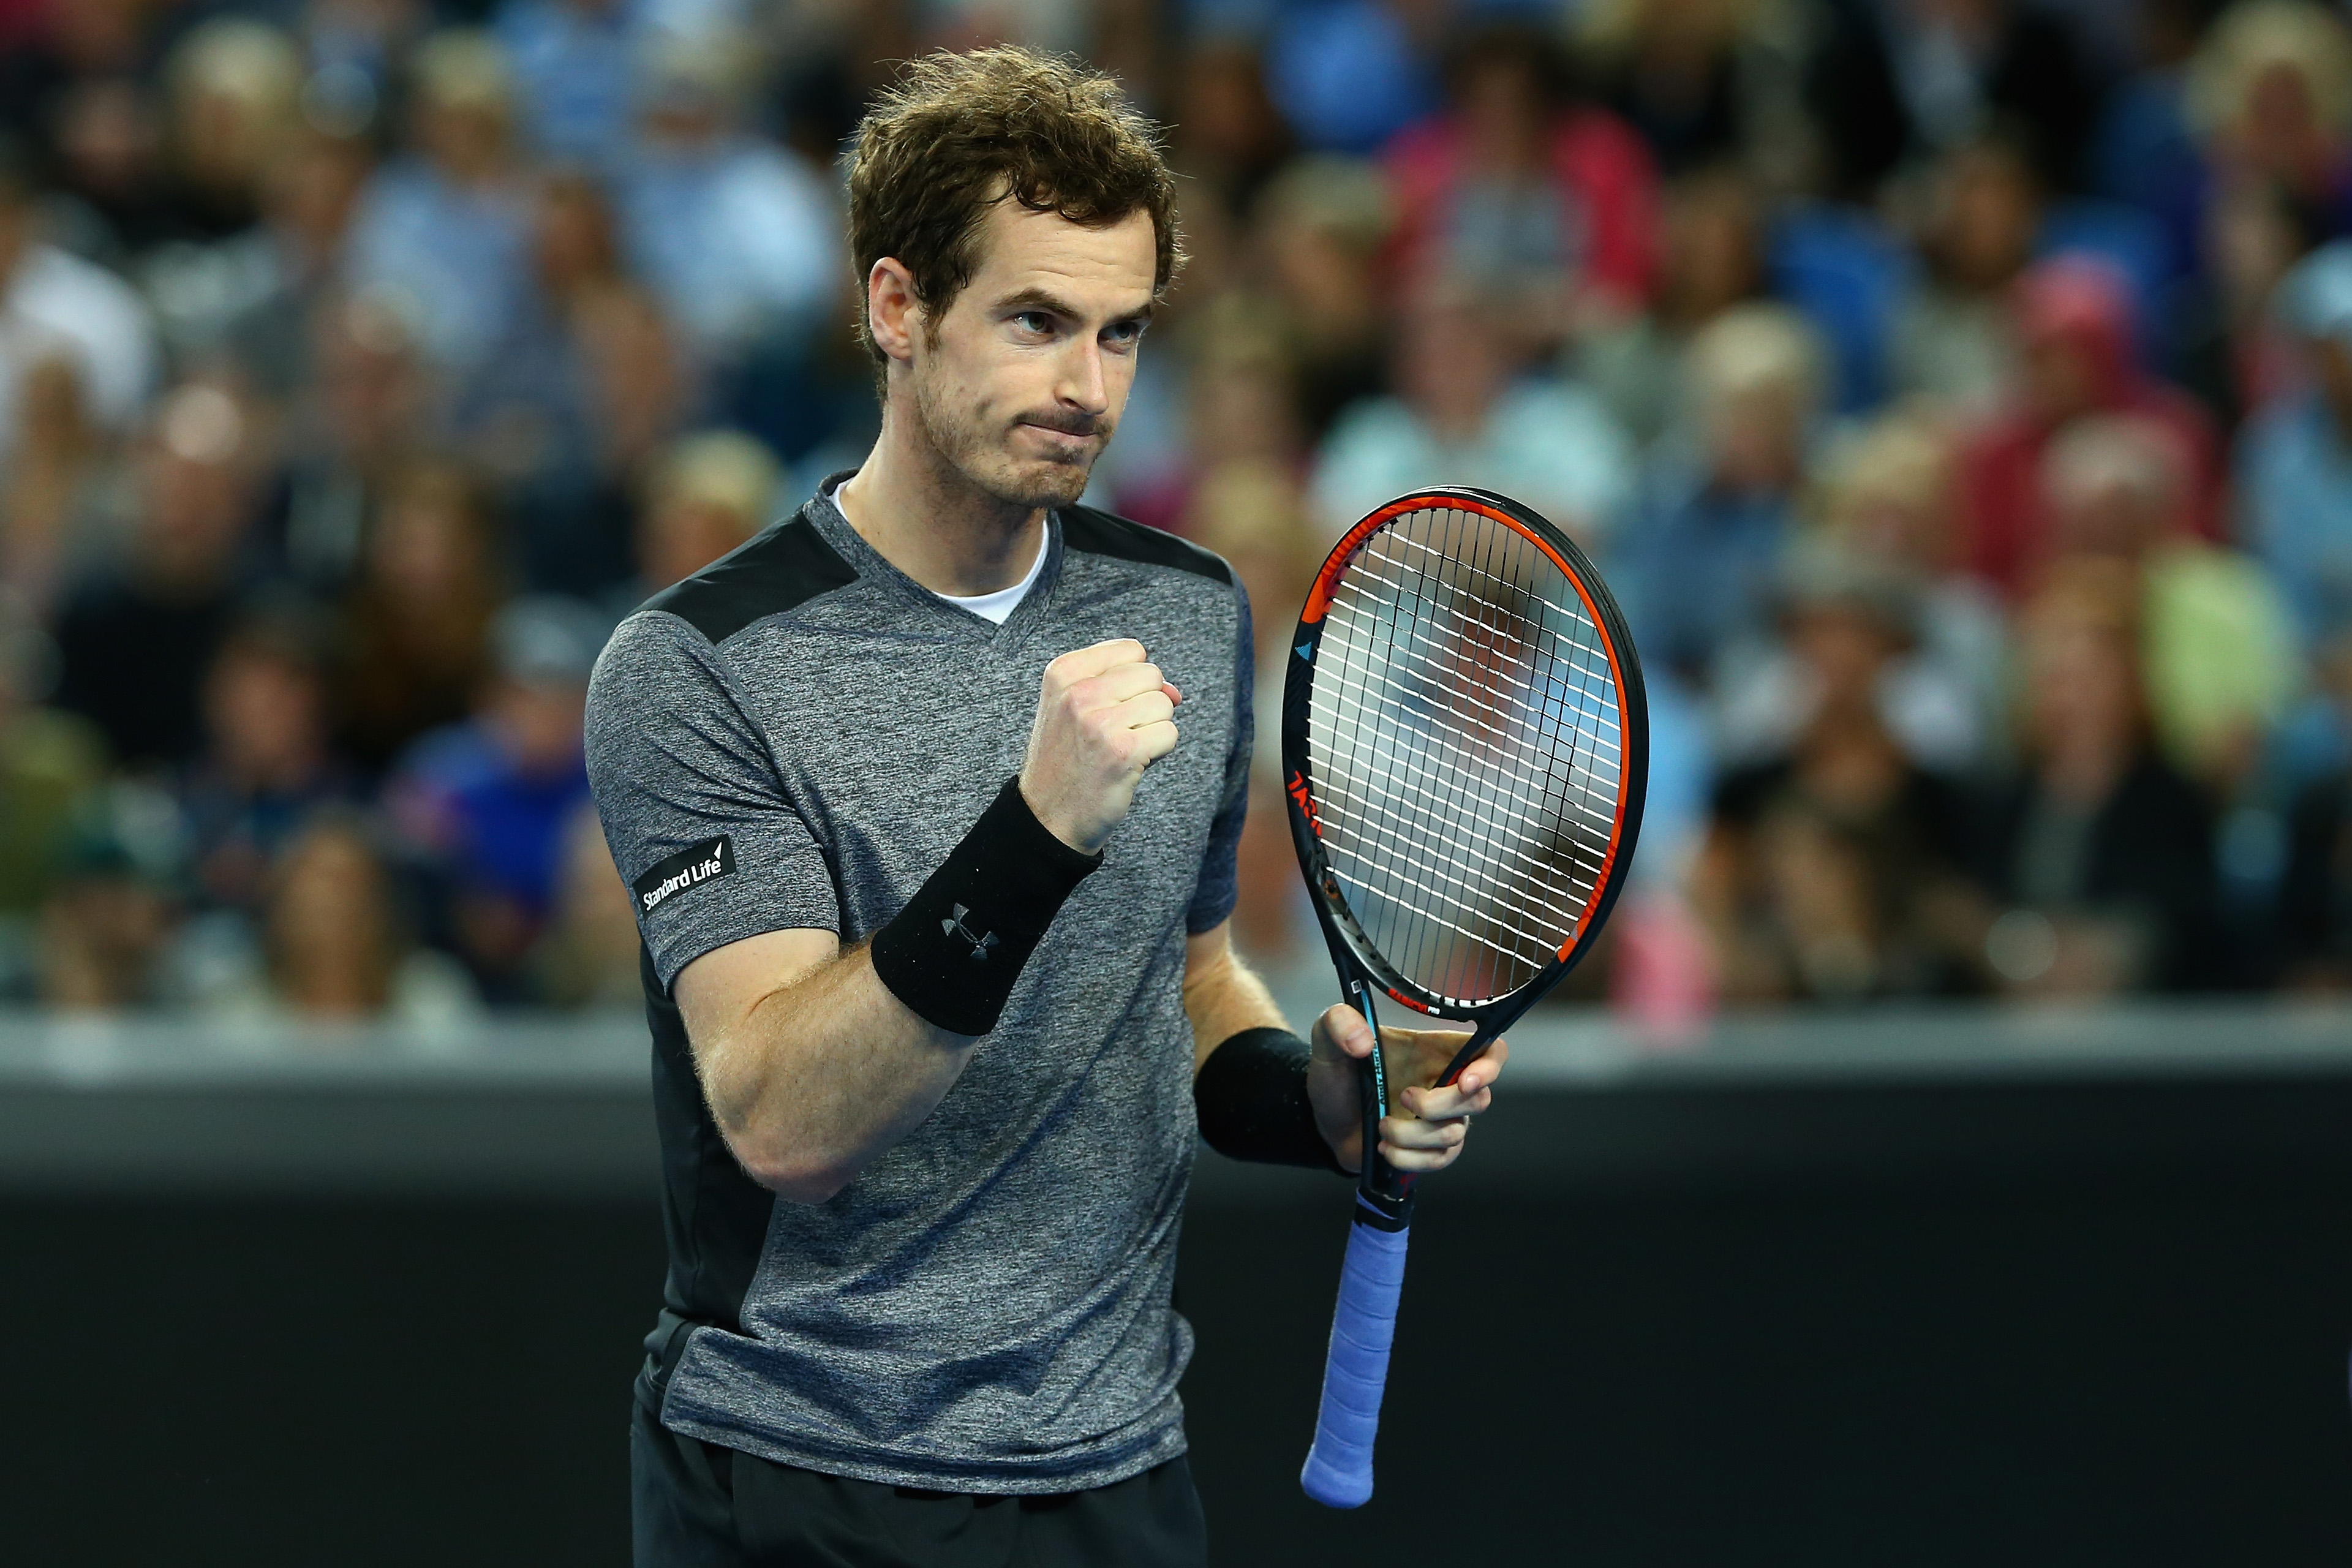 How Many Grand Slam Majors Have Novak Djokovic and Andy Murray Won, andy murray, novak djokovic, grand slams, how many majors, how many grand slams, appeared, won total, andy murray majors, andy murray grand slams, djokovic majors, djokovic grand slams